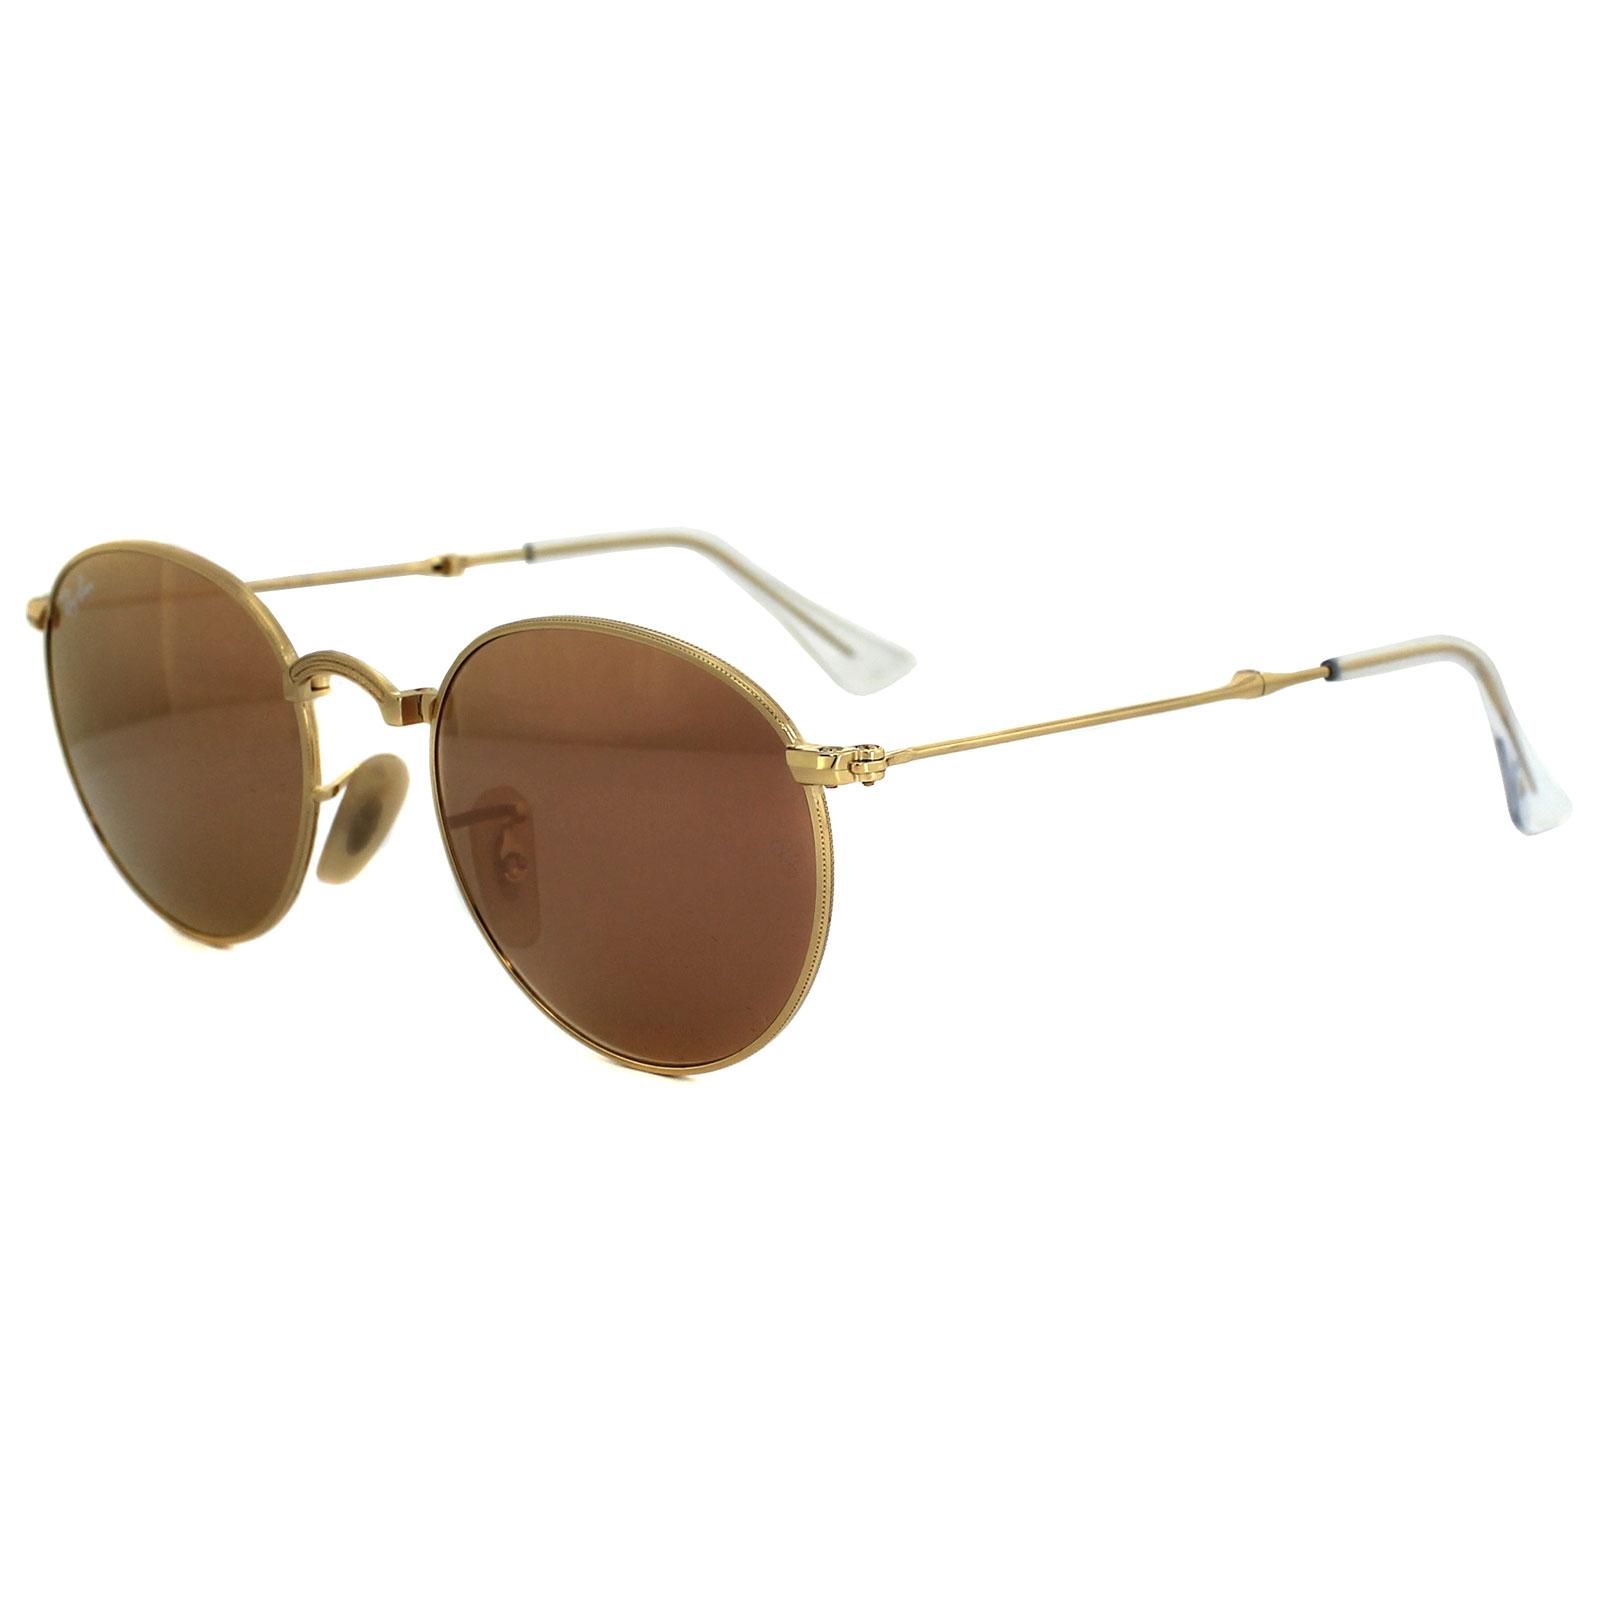 32354dbb66 Sentinel Ray-Ban Sunglasses Round Folding 3532 001 Z2 Gold Copper Mirror  50mm